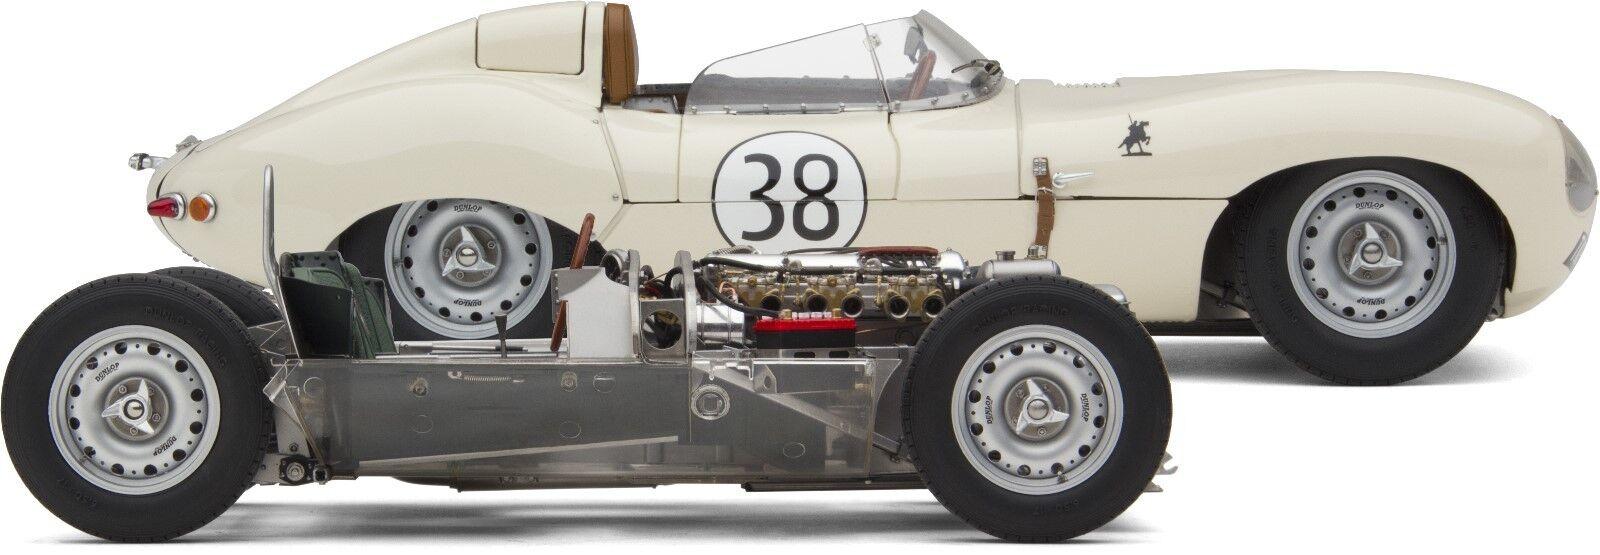 Exoto XS 1 18 Jim Clark 1958 Jaguar Tipo D & Rodar Chasis  Bnd22084